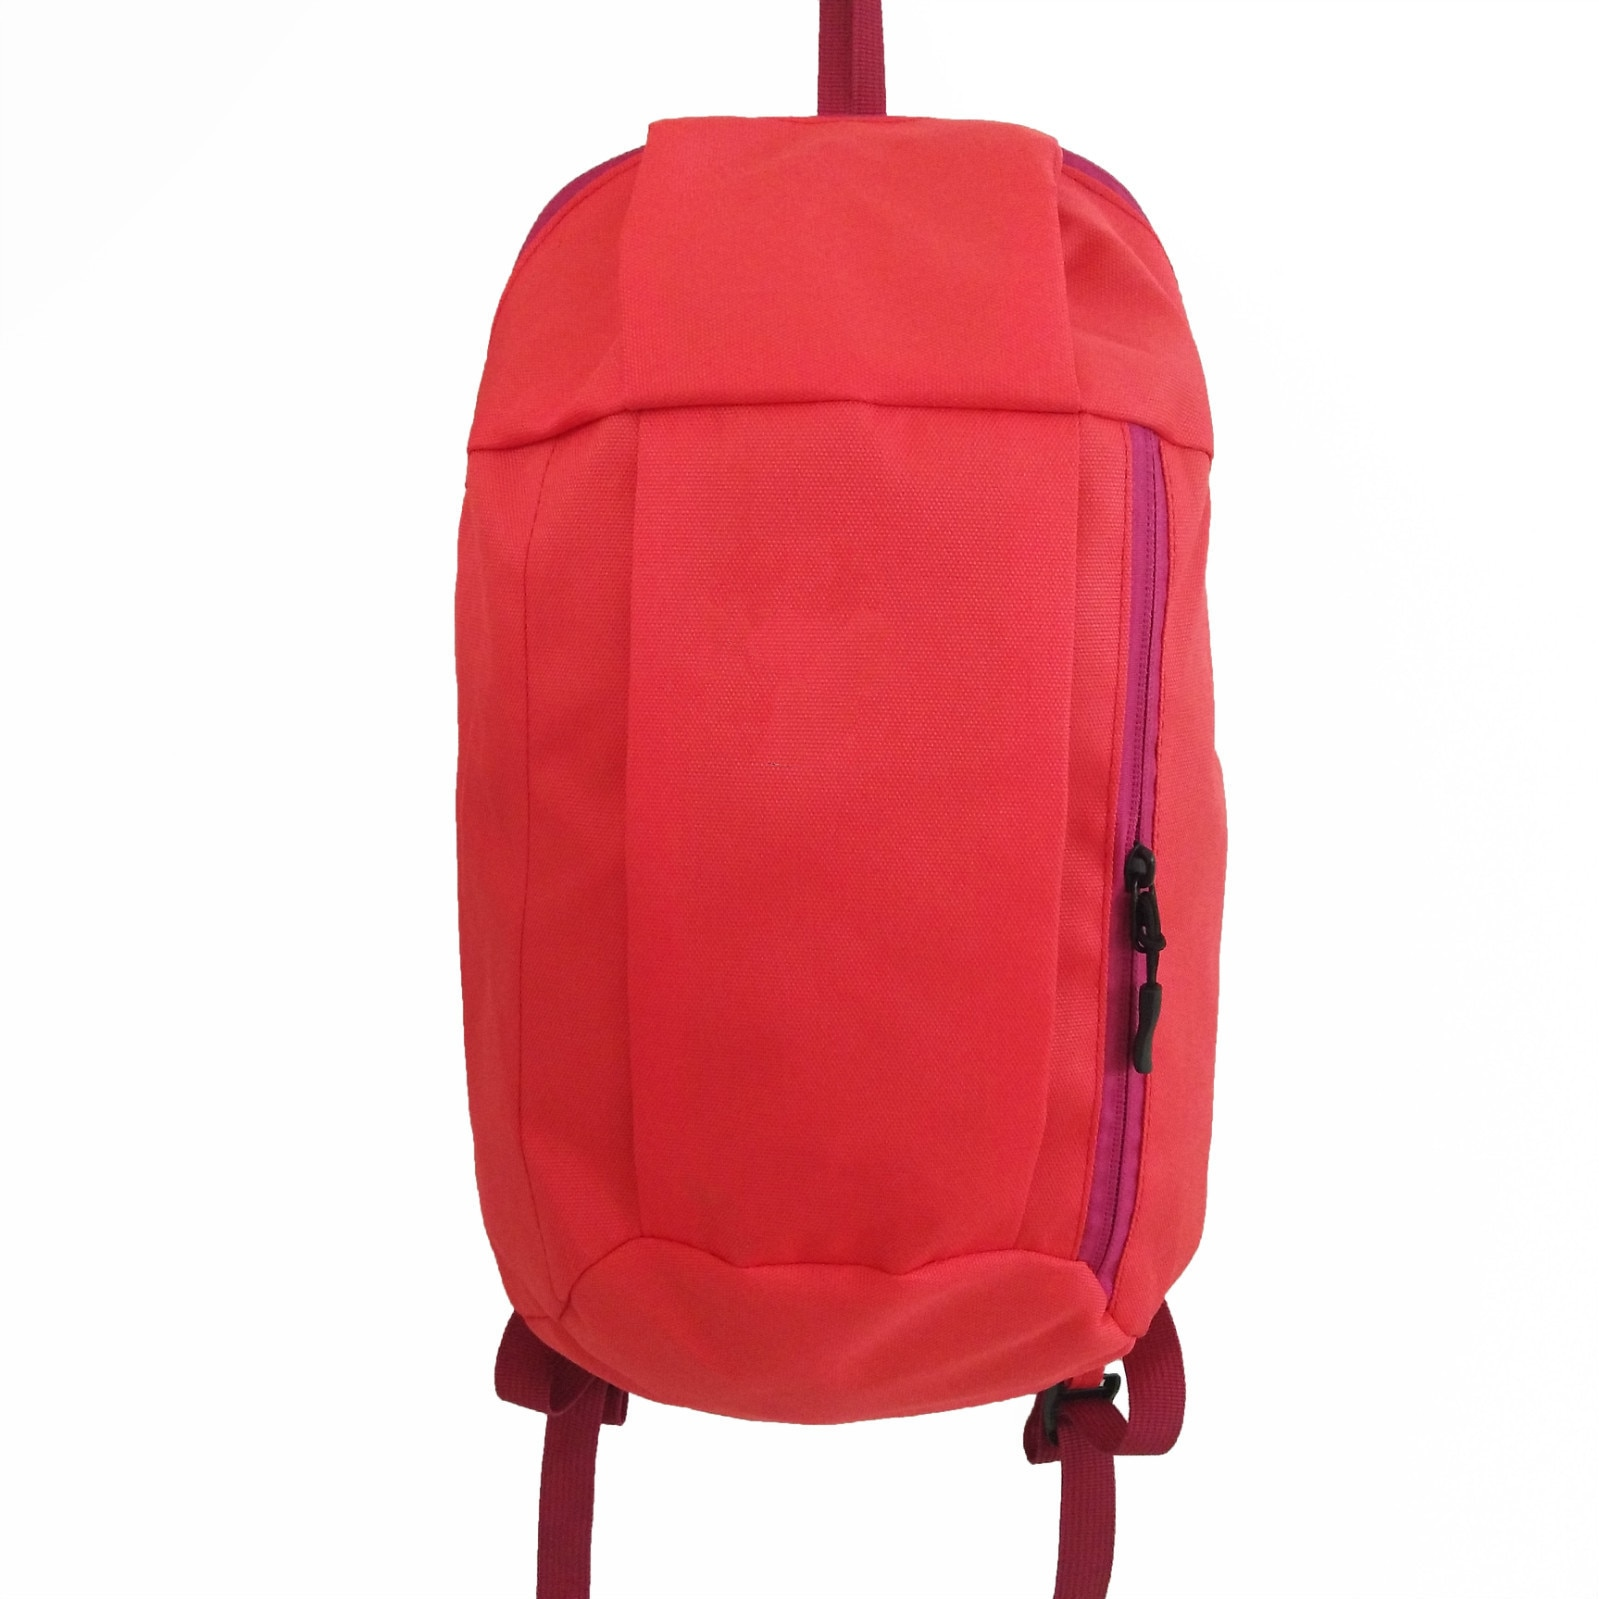 Decathlon estilo celebridade mochila publicidade saco de escola saco de desporto saco de escola de treinamento personalizável logotipo impresso